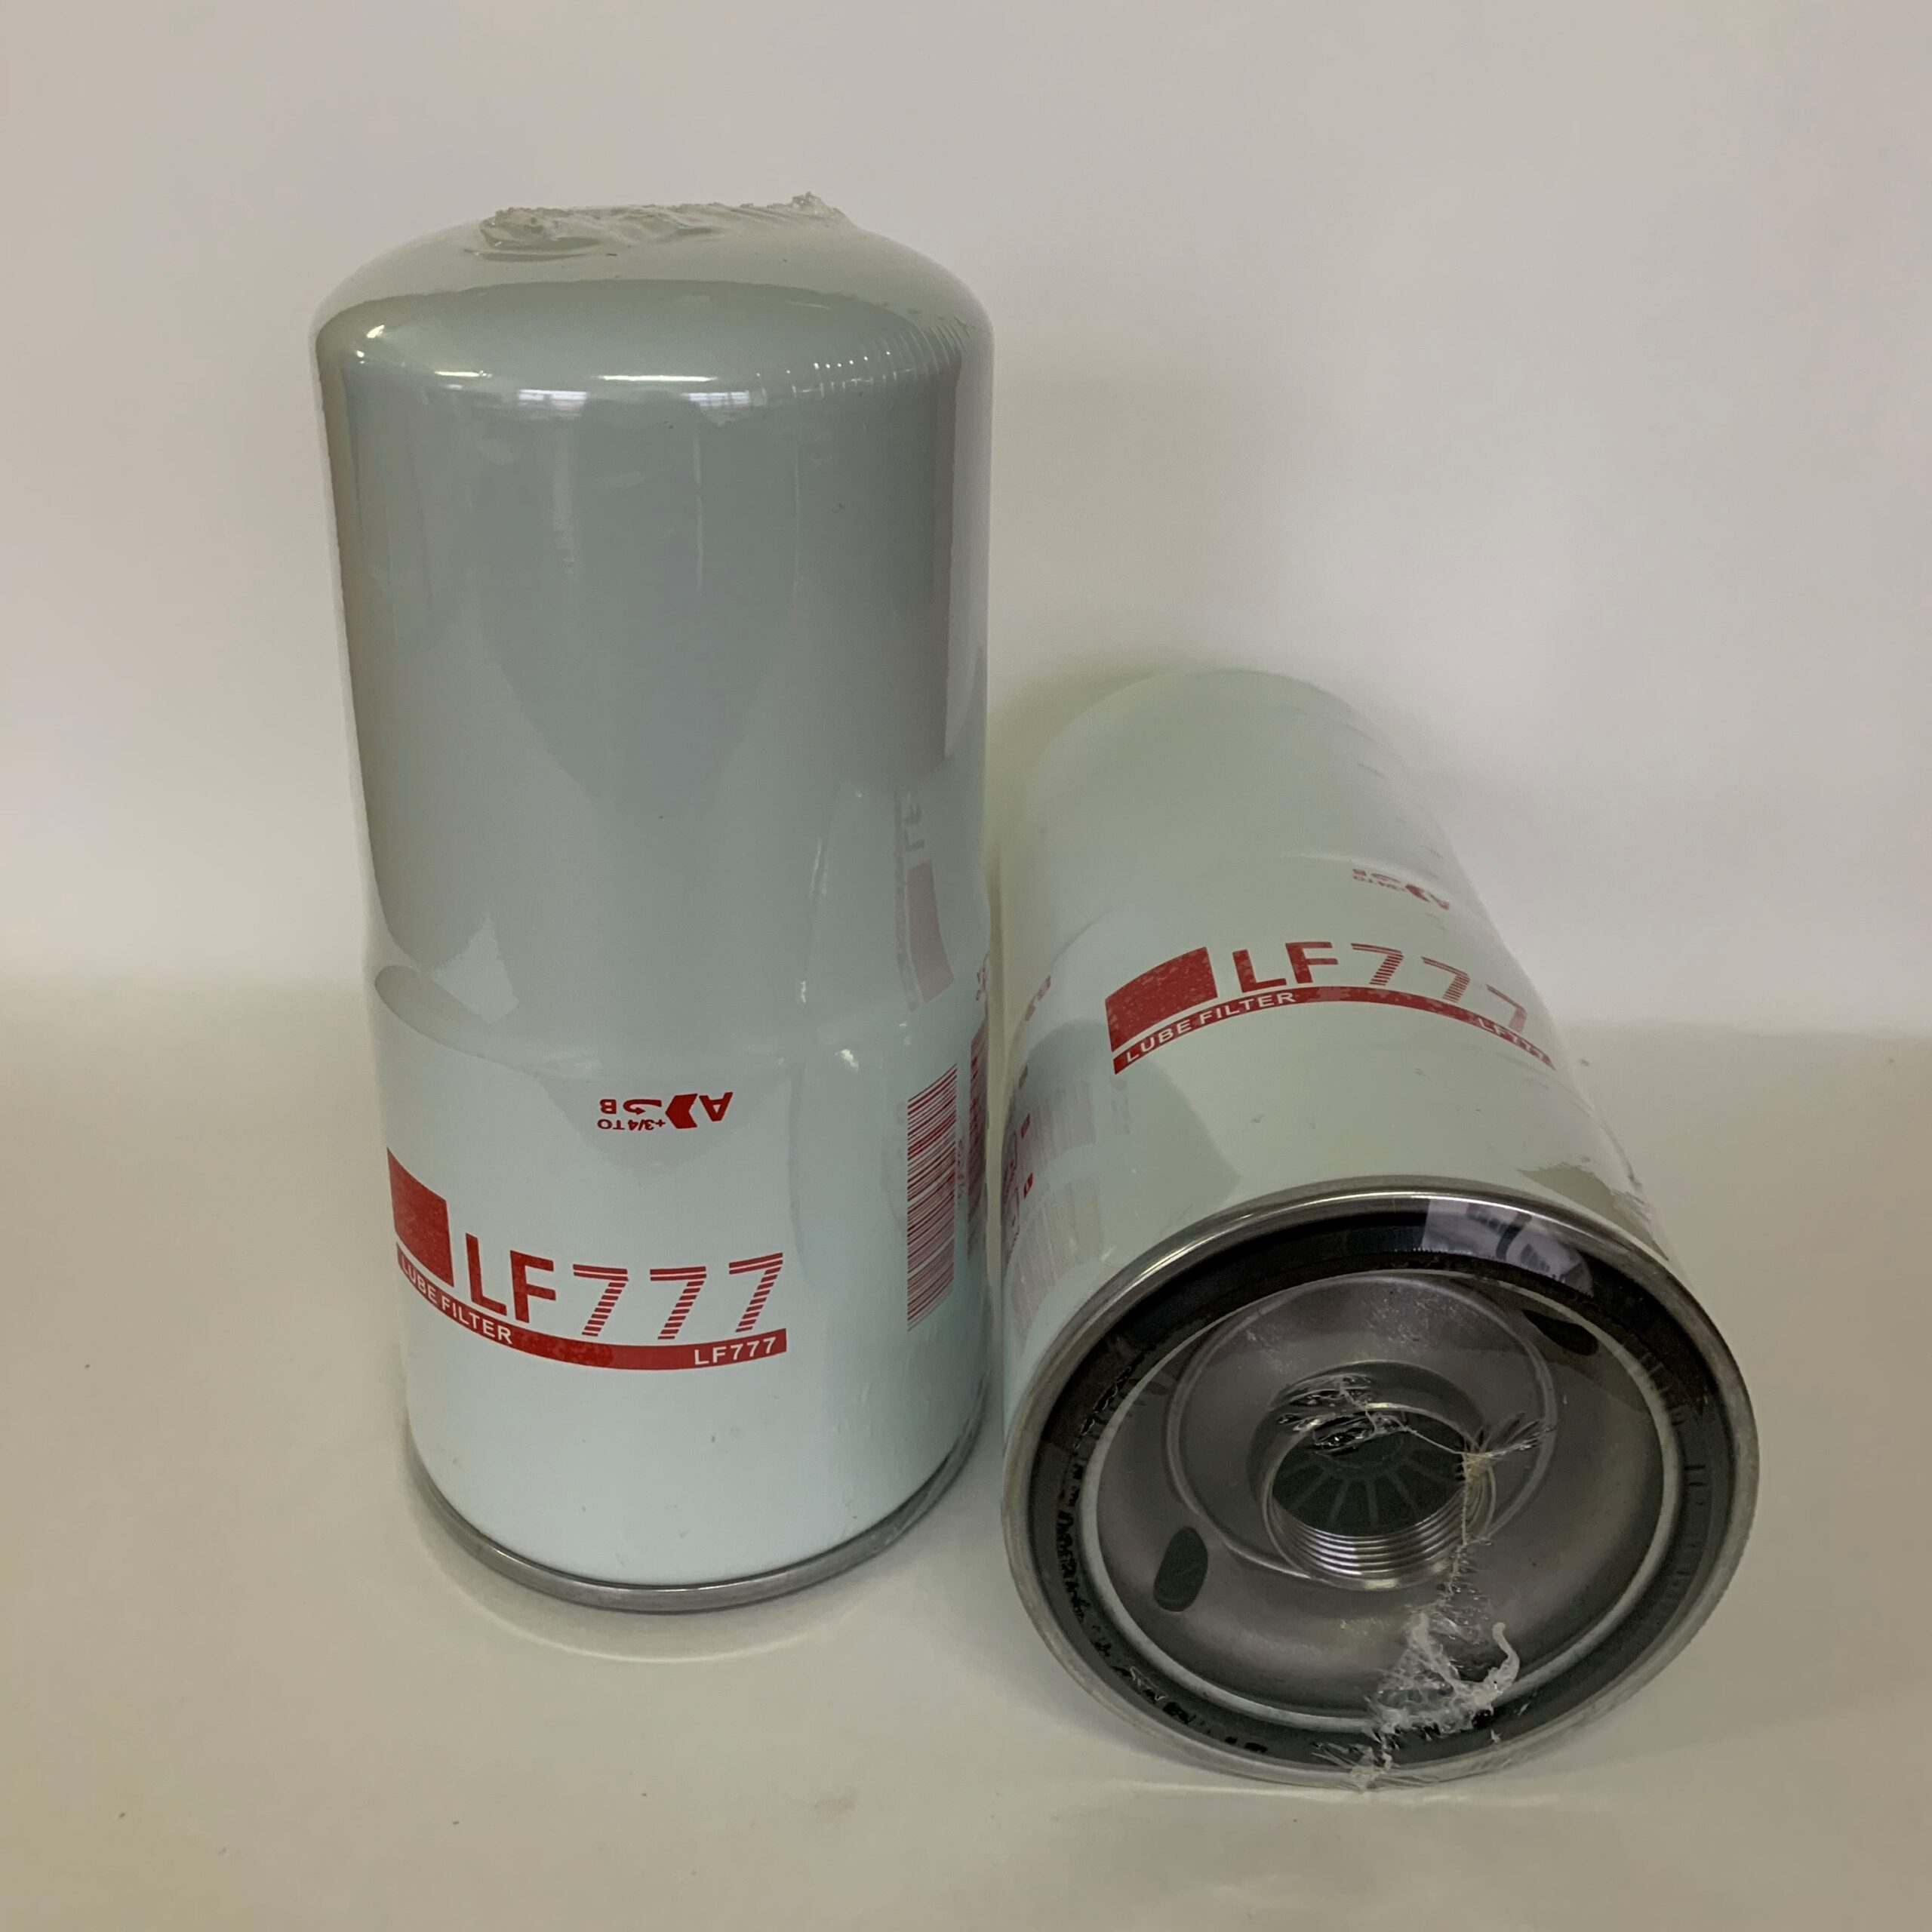 LF777